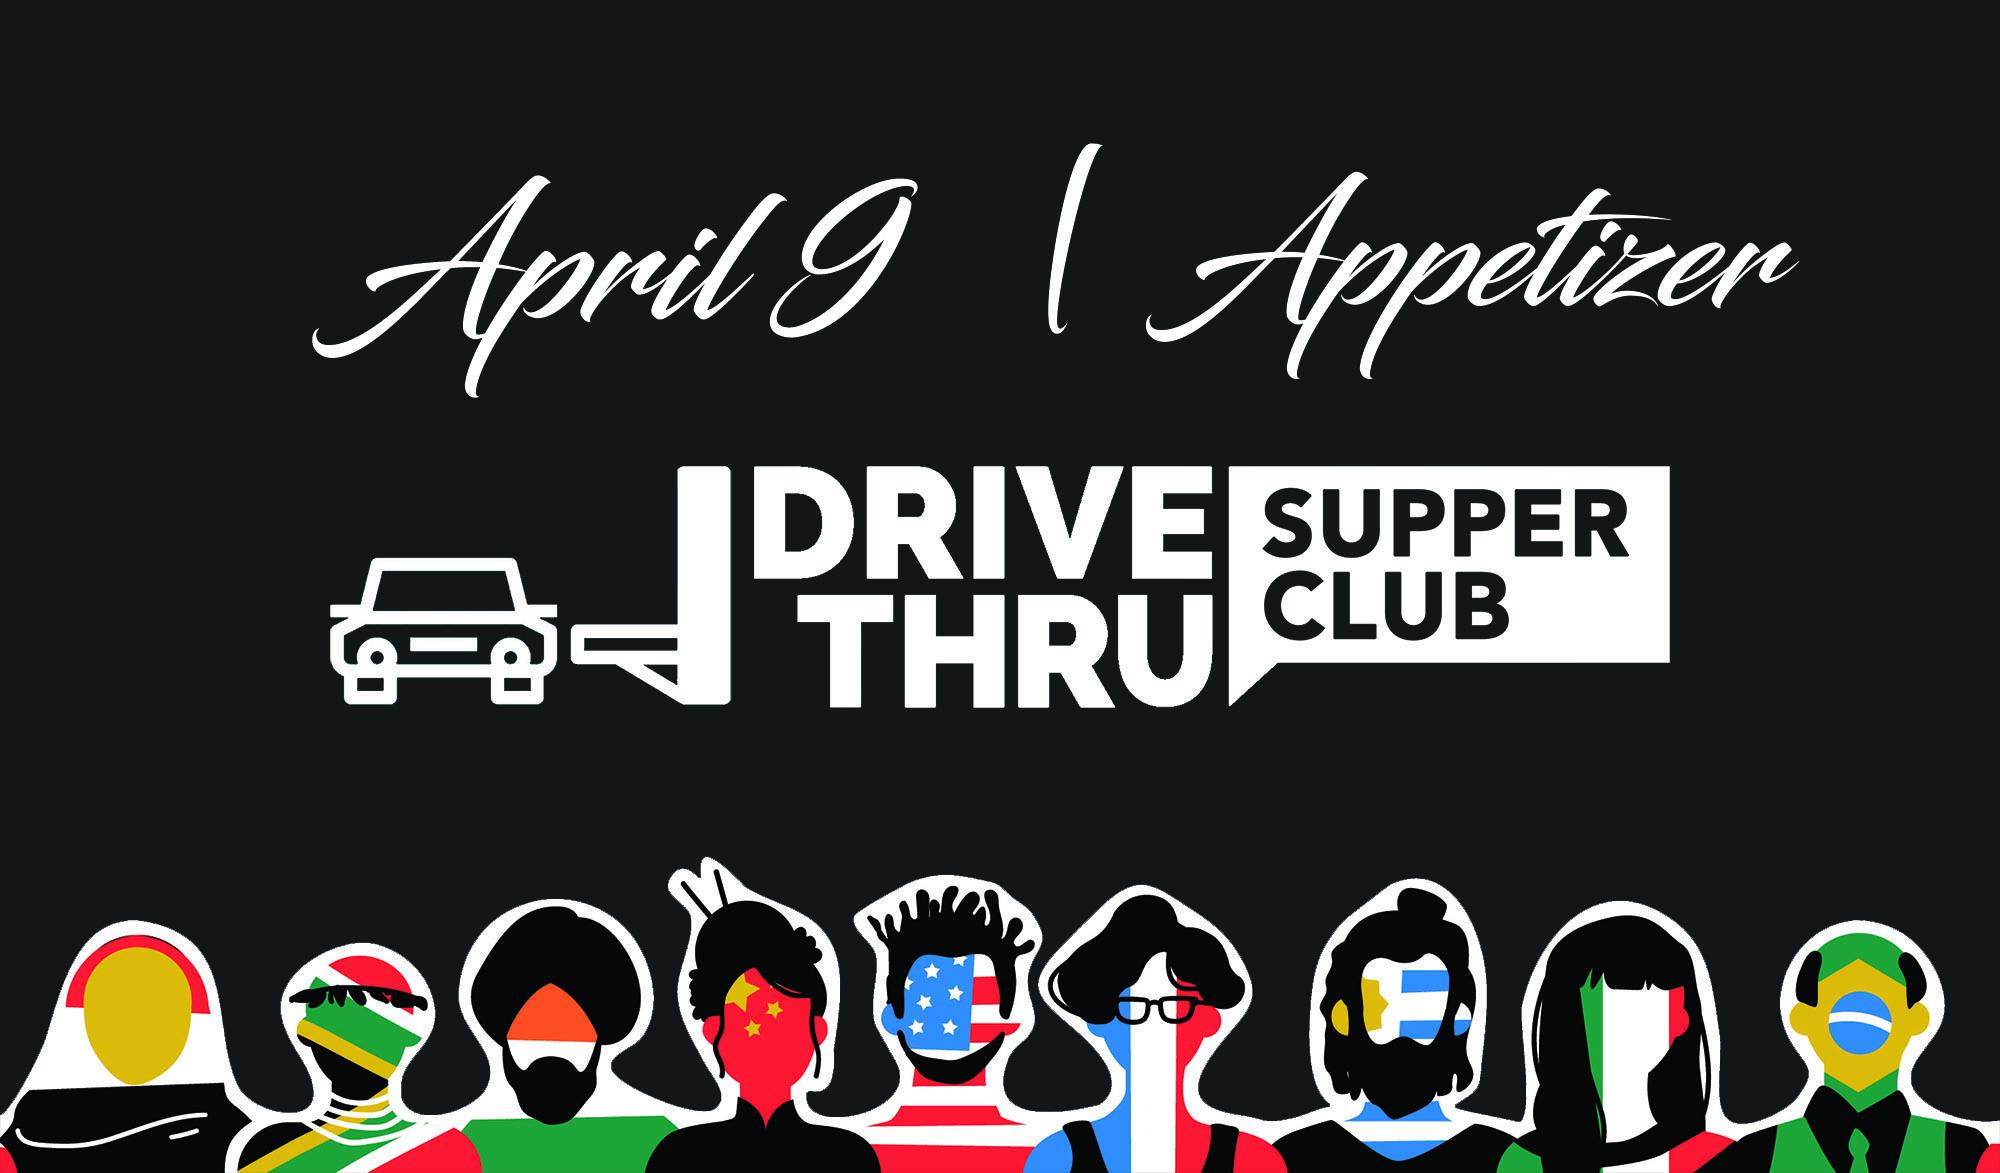 April 9 Indian Appetizer Event